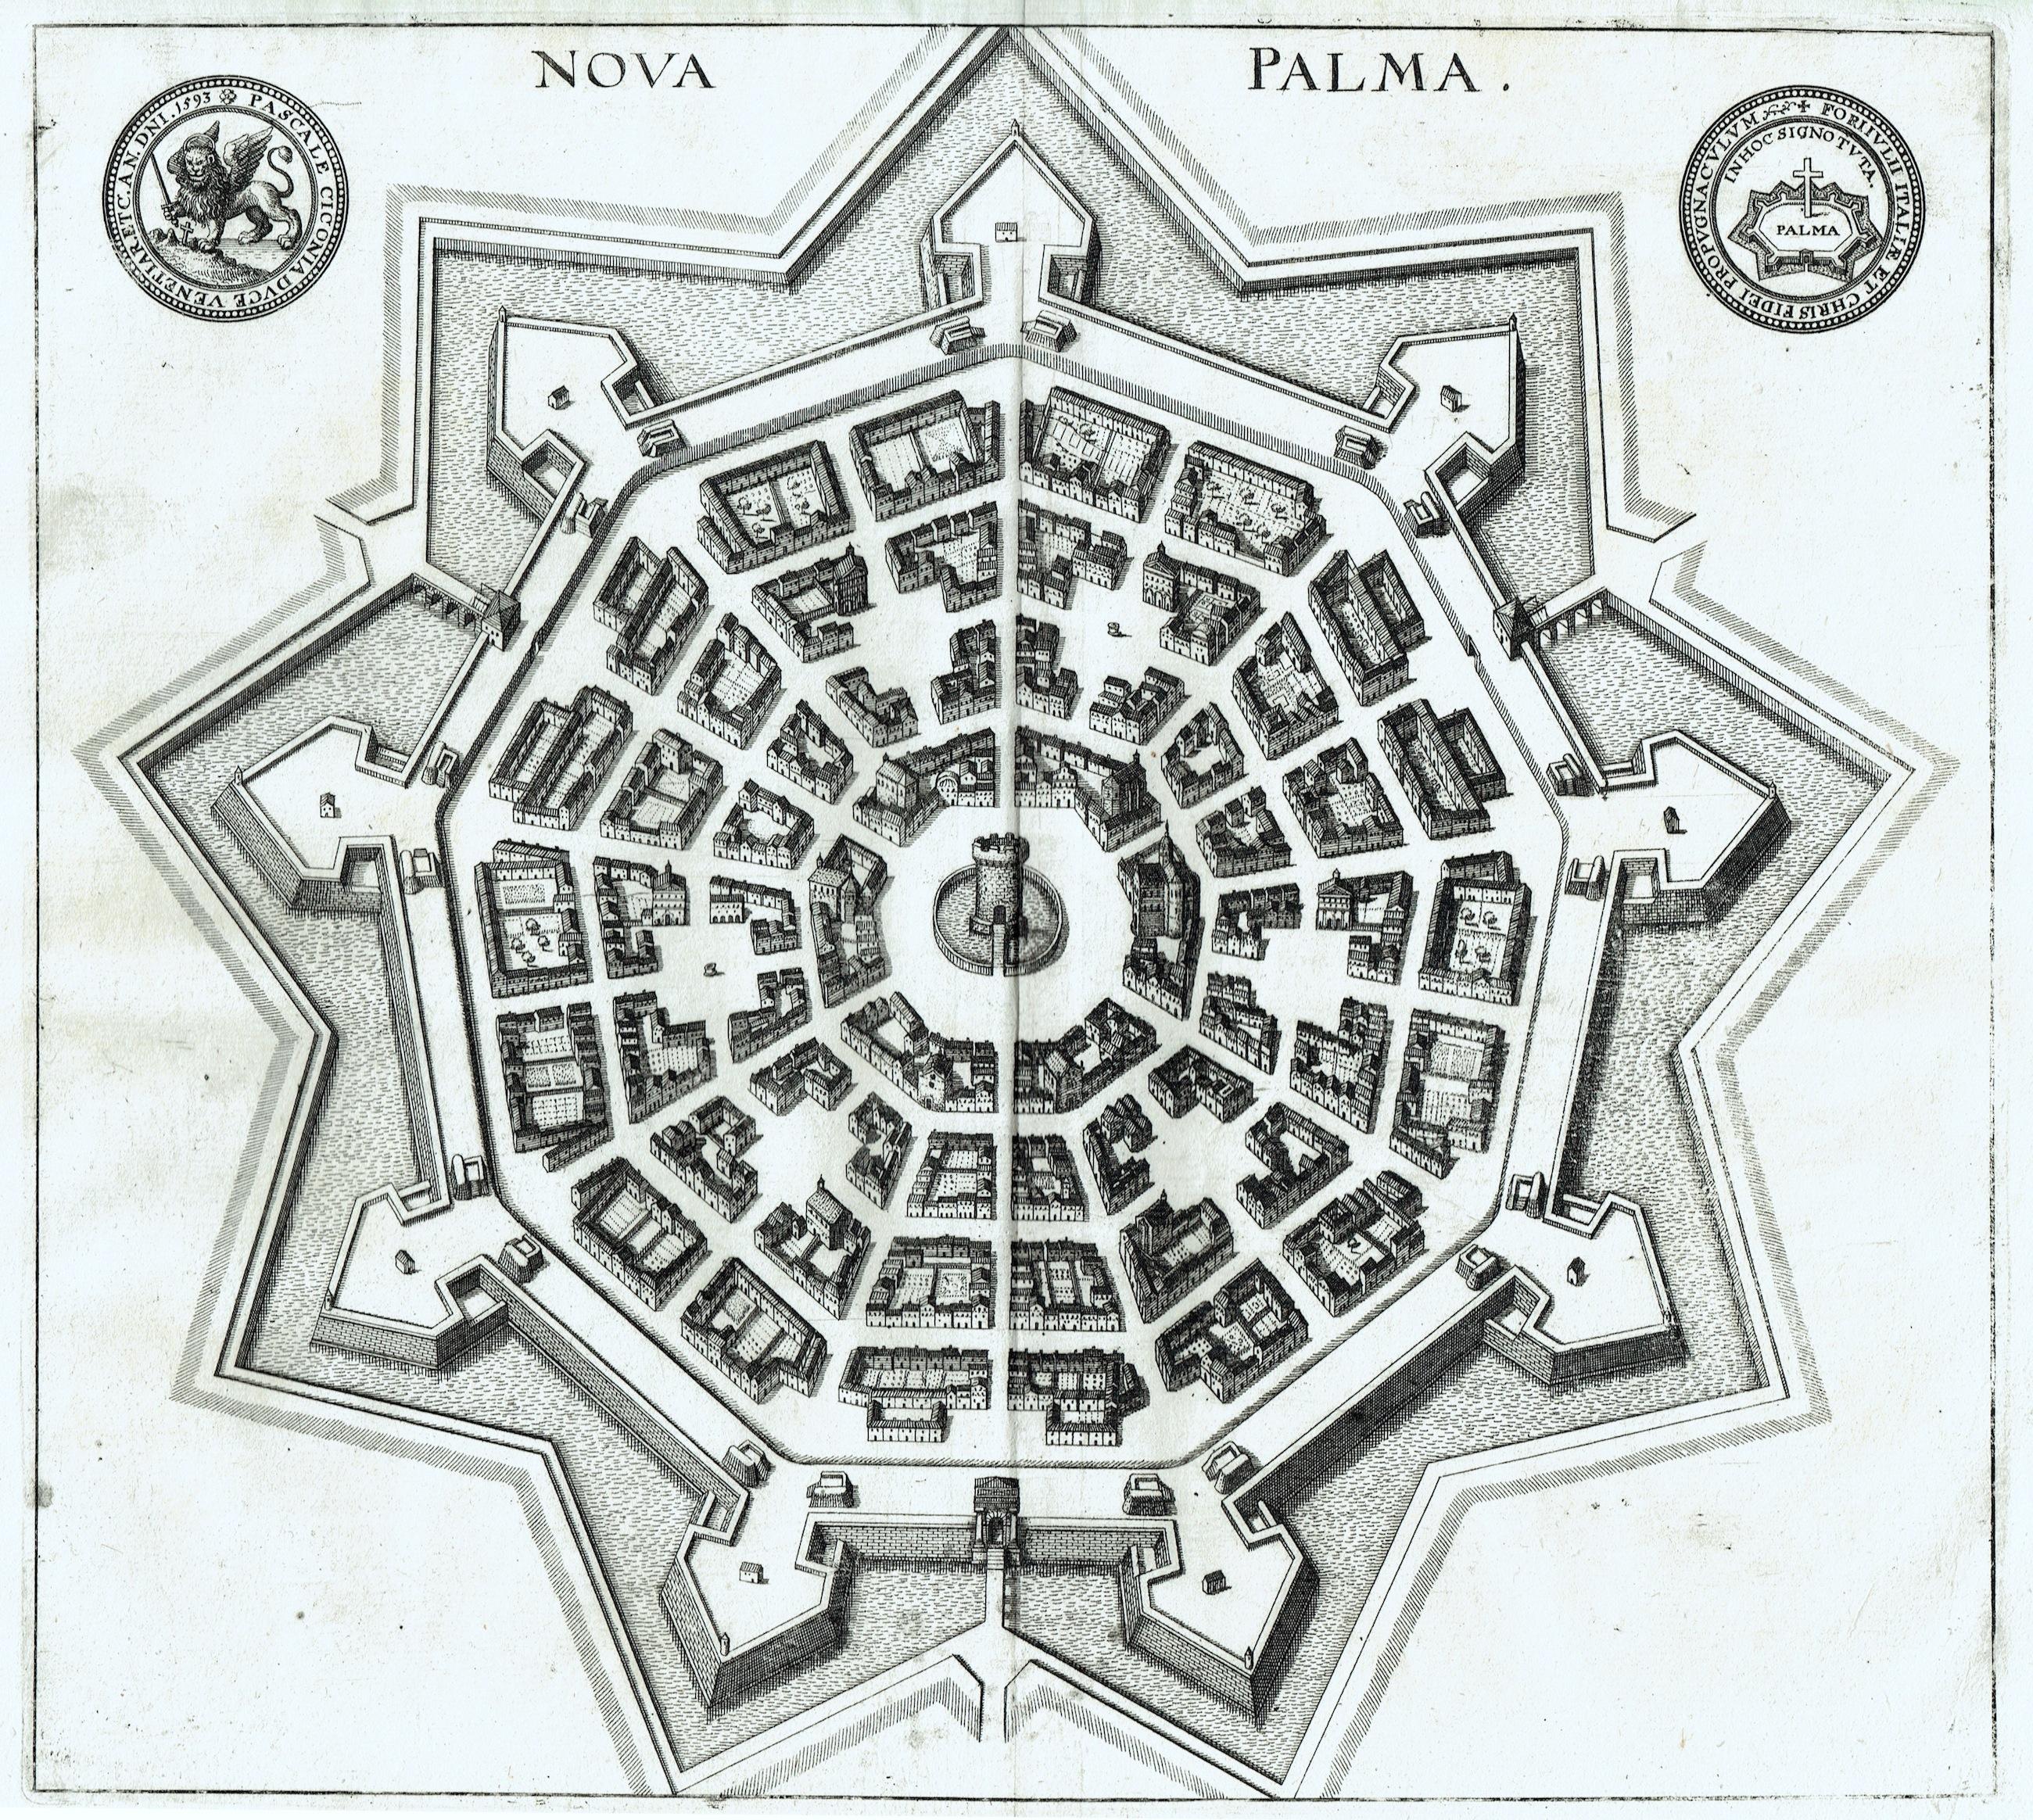 palmanova sito